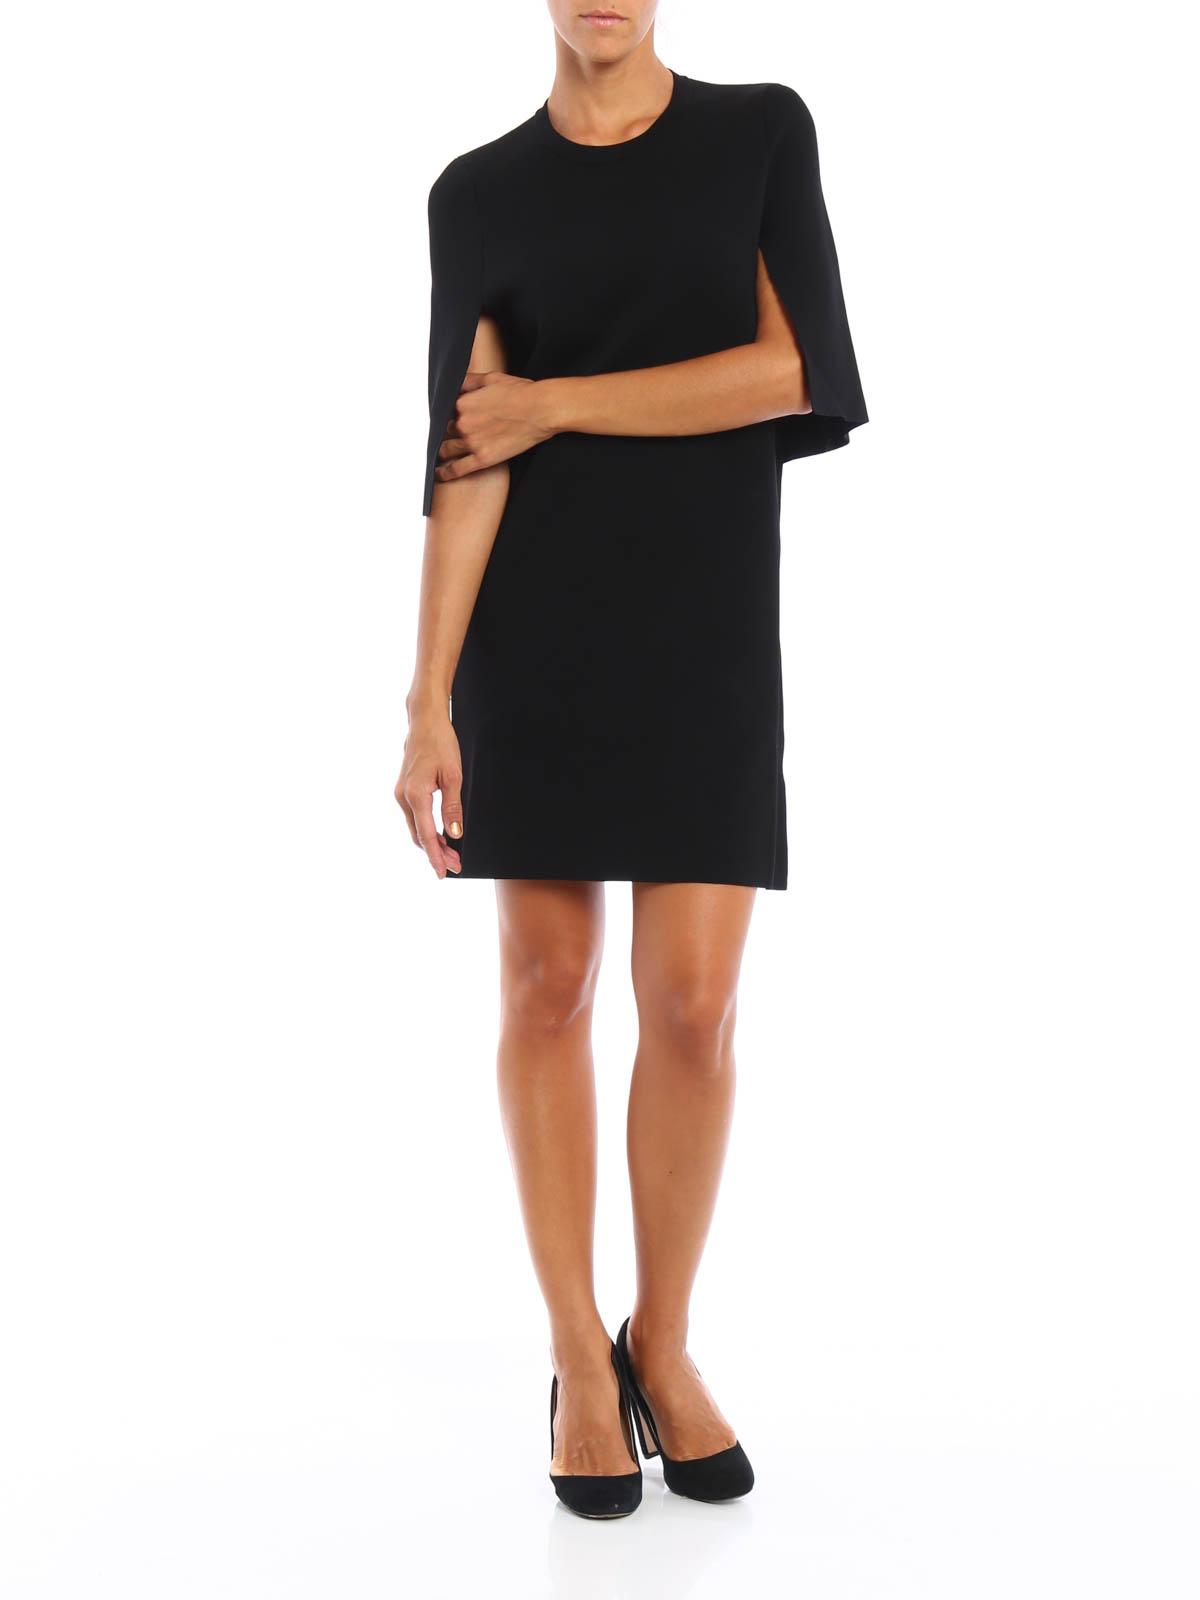 neil barrett - kurzes kleid - schwarz - kurze kleider